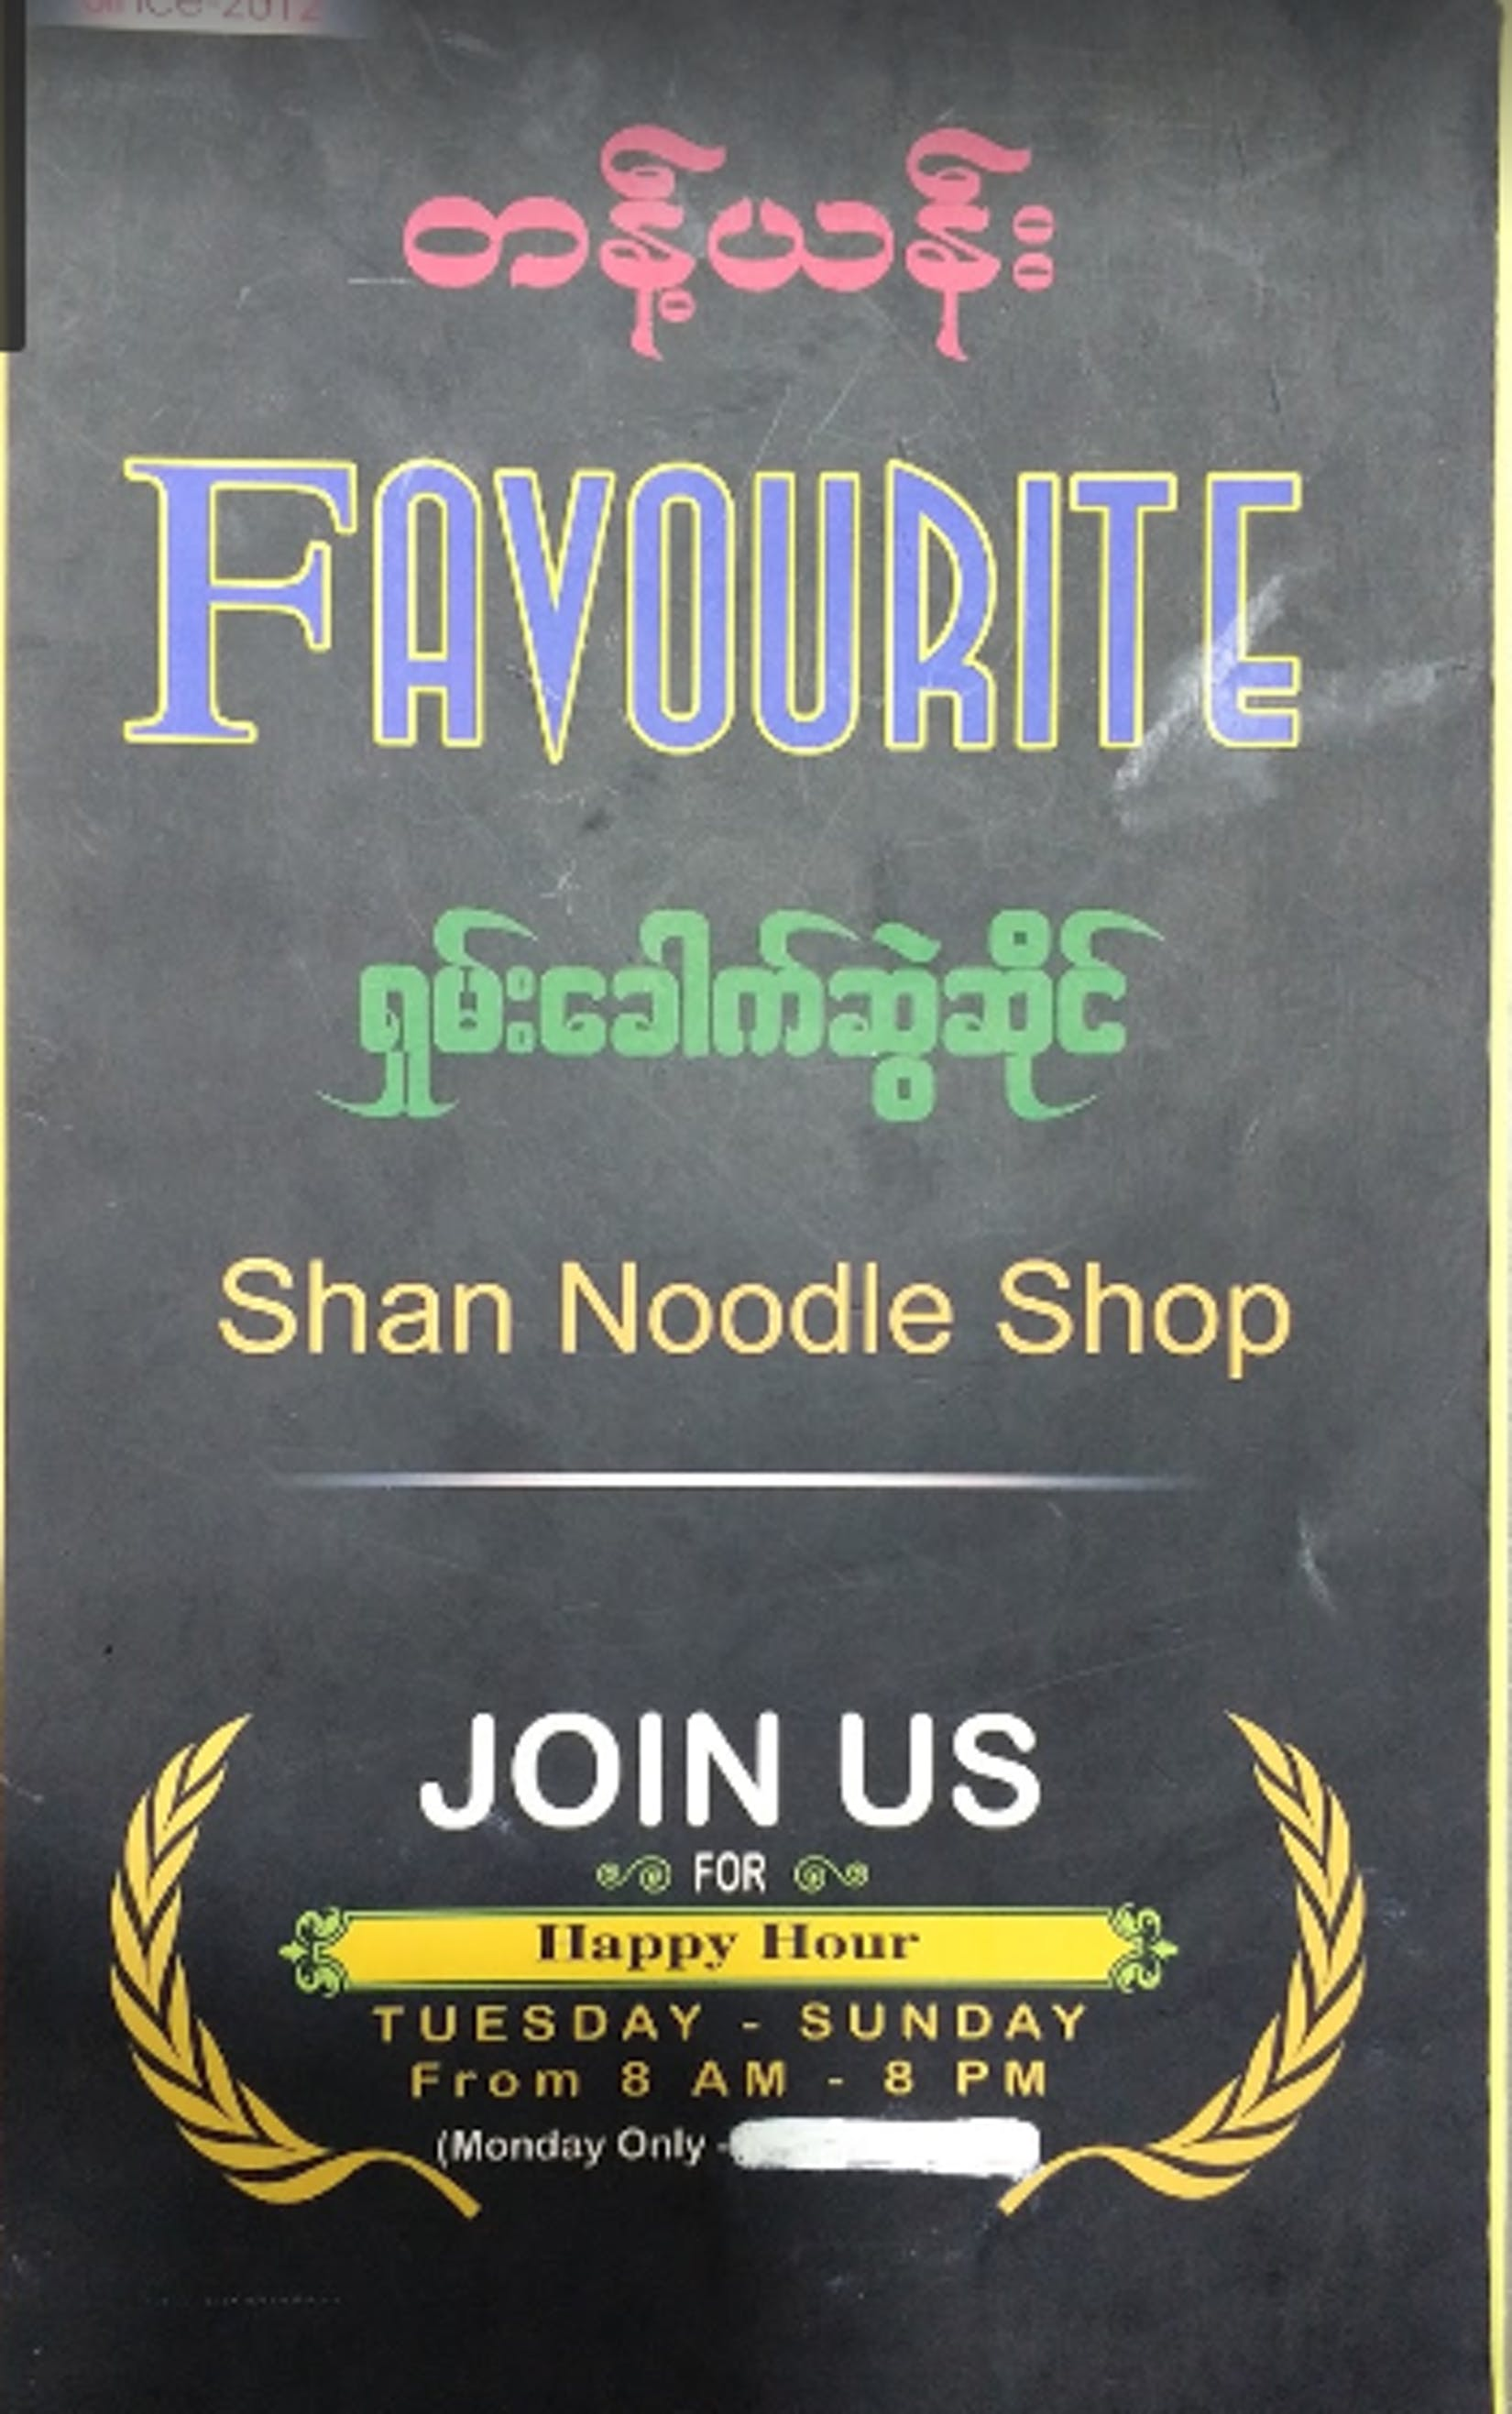 Shan Noodle Shop | yathar